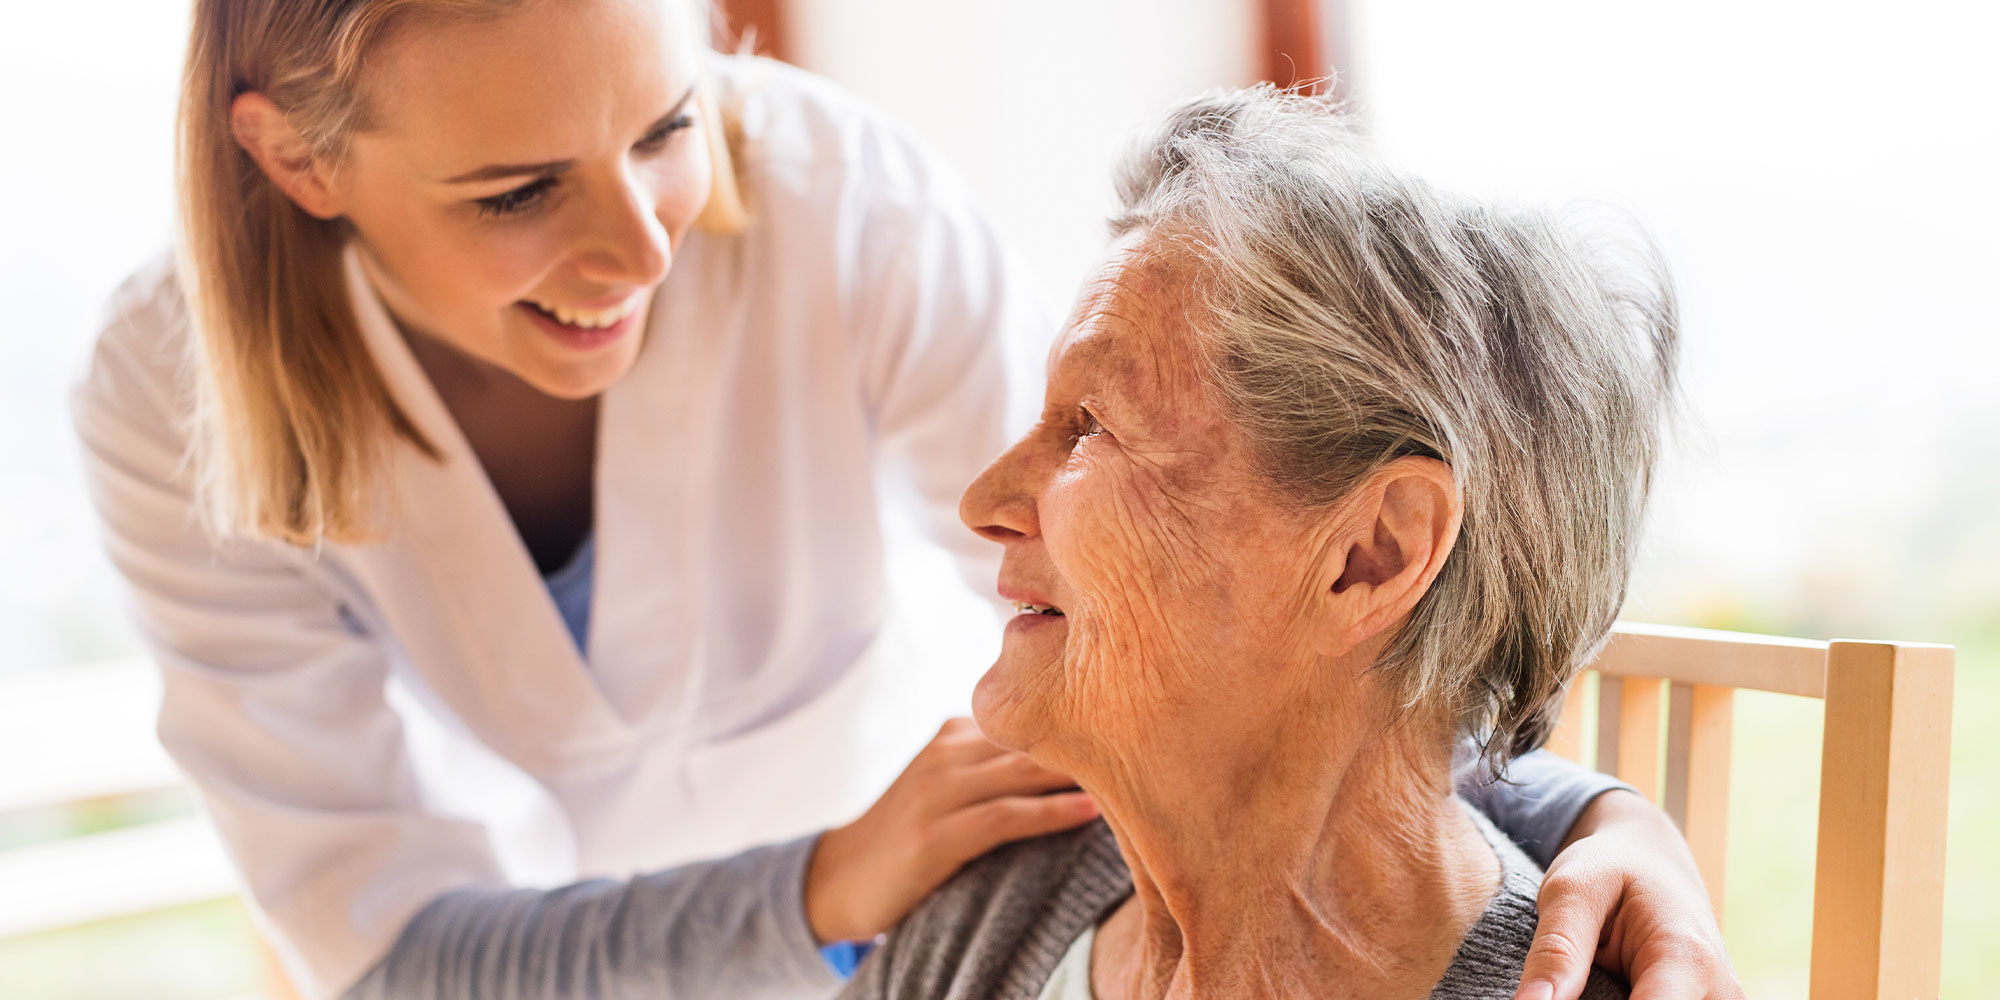 Nurse and a senior woman during checkup.